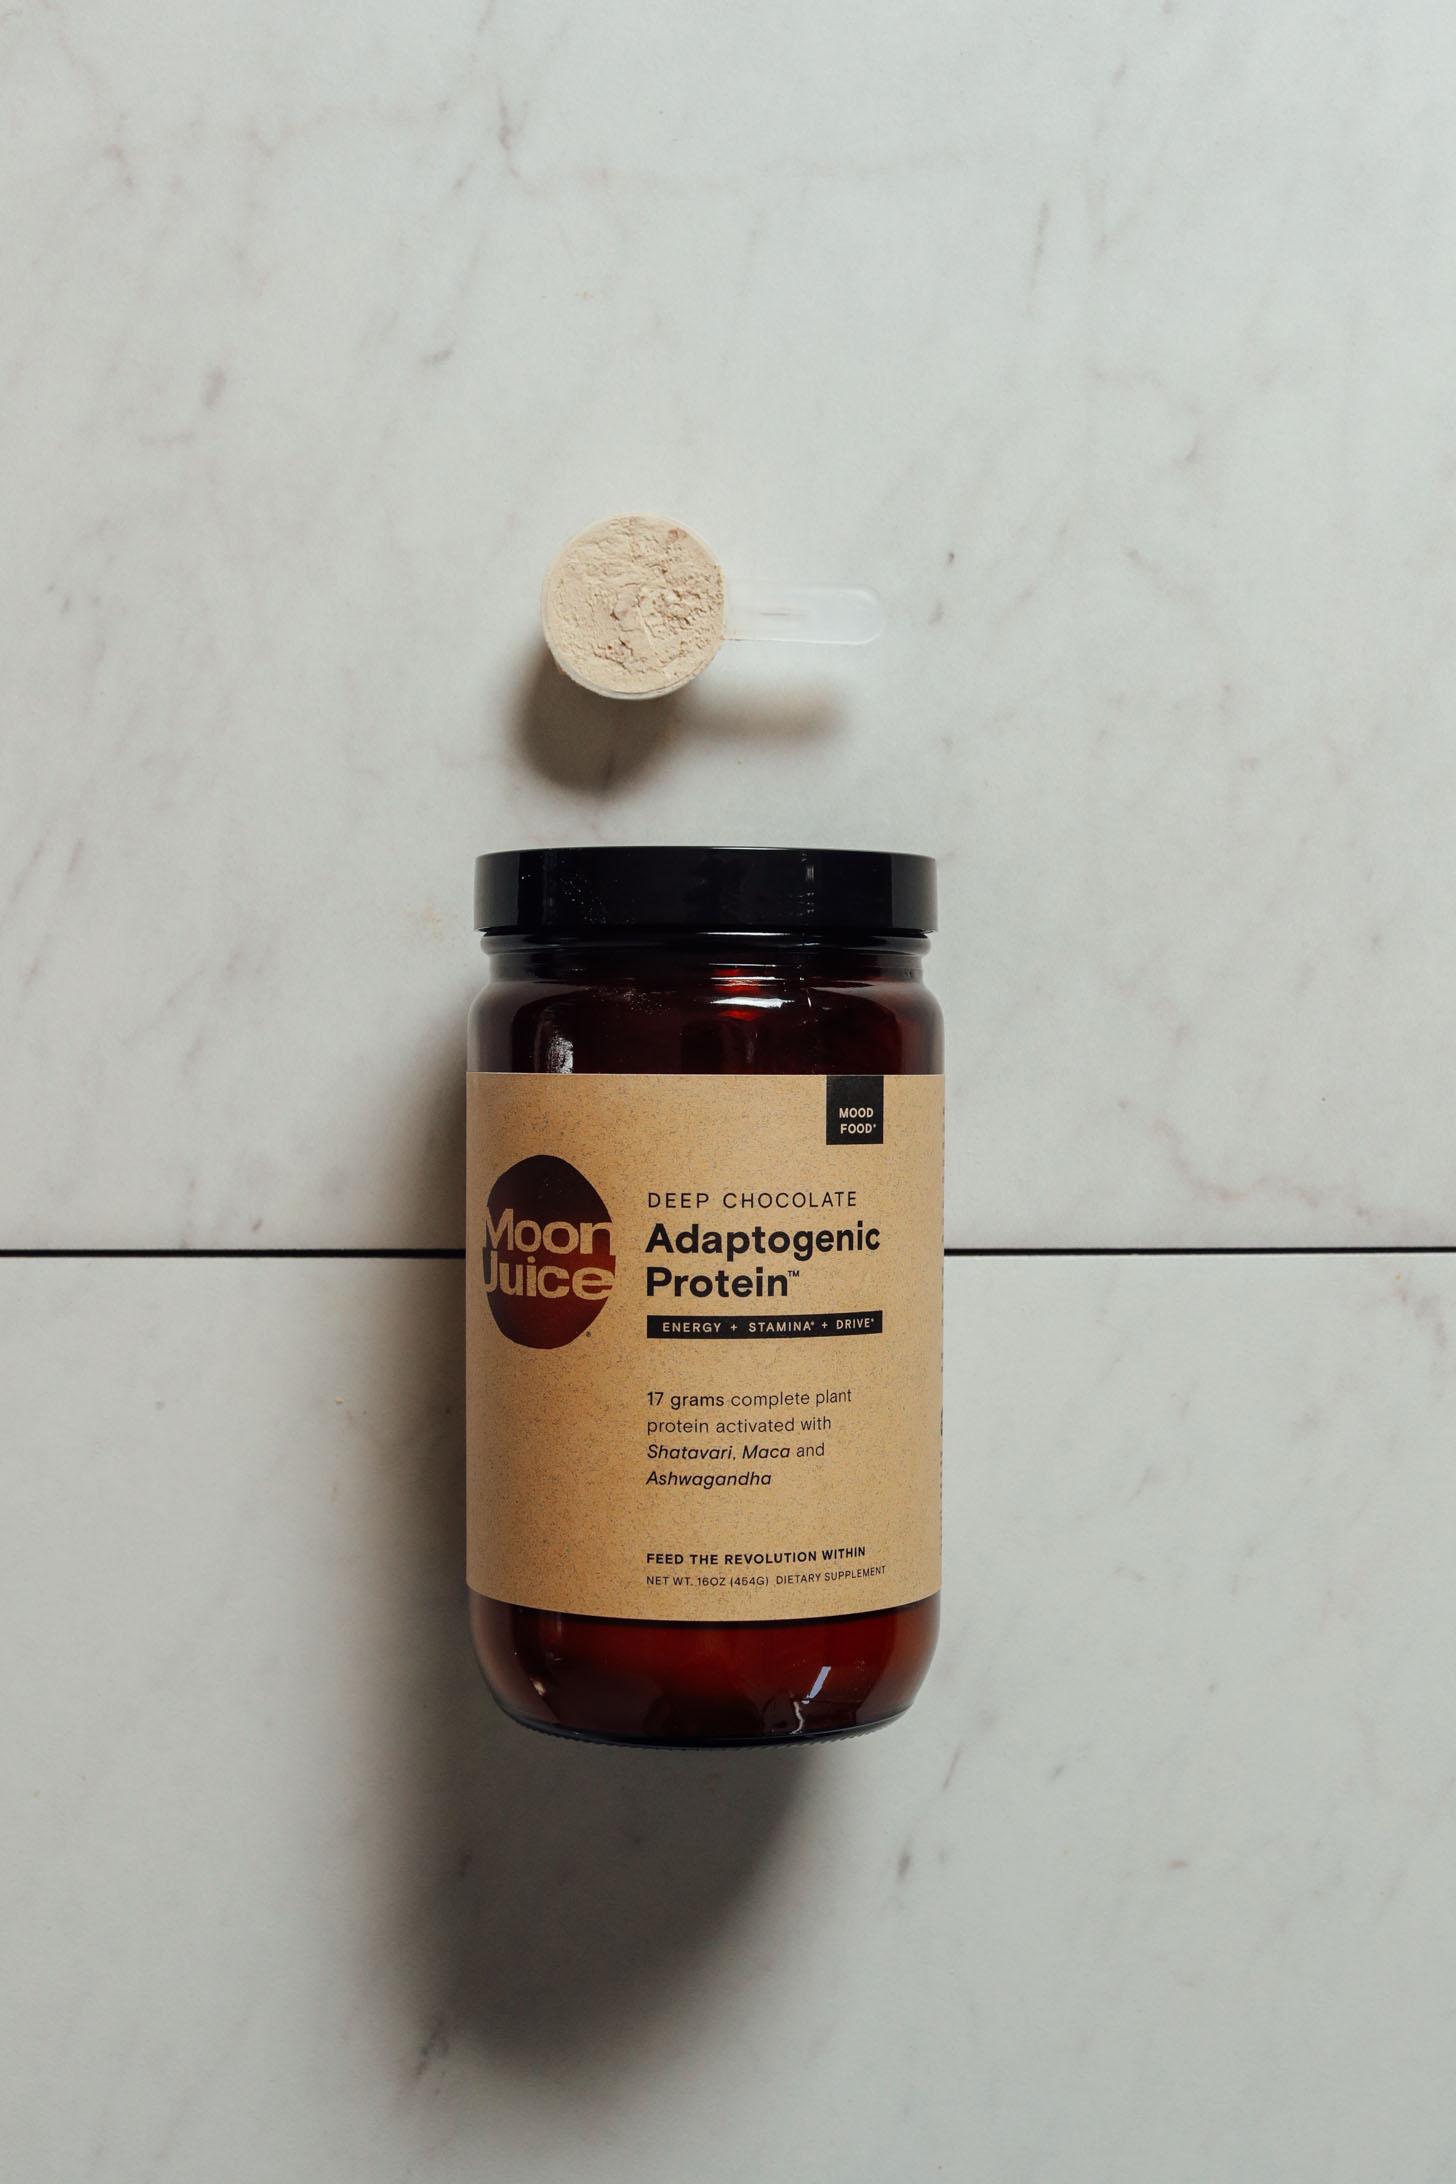 Jar and scoop of Moon Juice Adaptogenic Chocolate Protein Powder